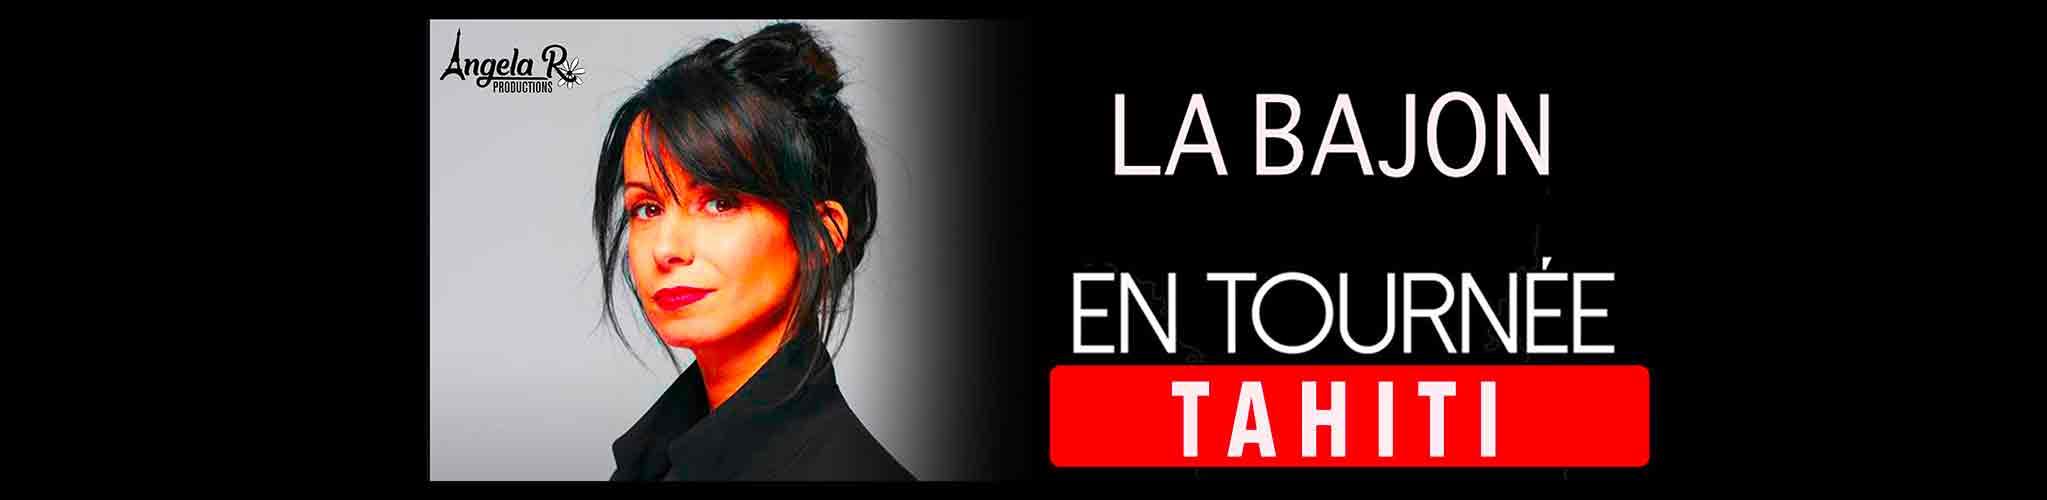 LABAJON EN TOURNEE A TAHITI